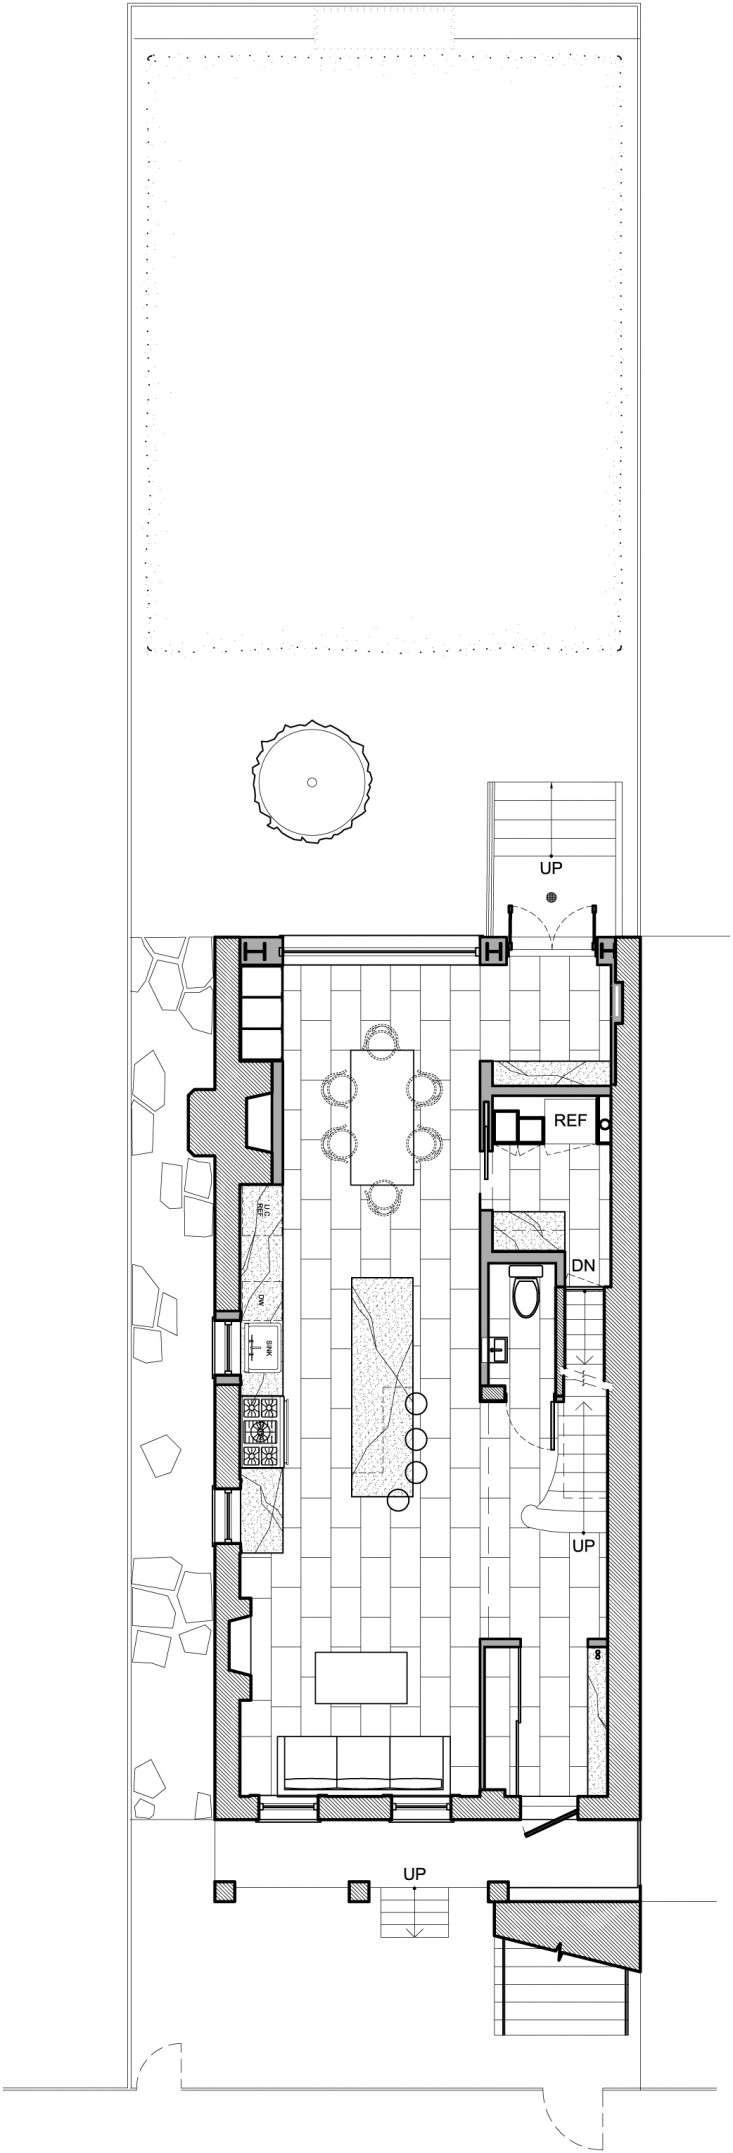 Annabelle-Selldorf-Brooklyn-kitchen-renovation-layout